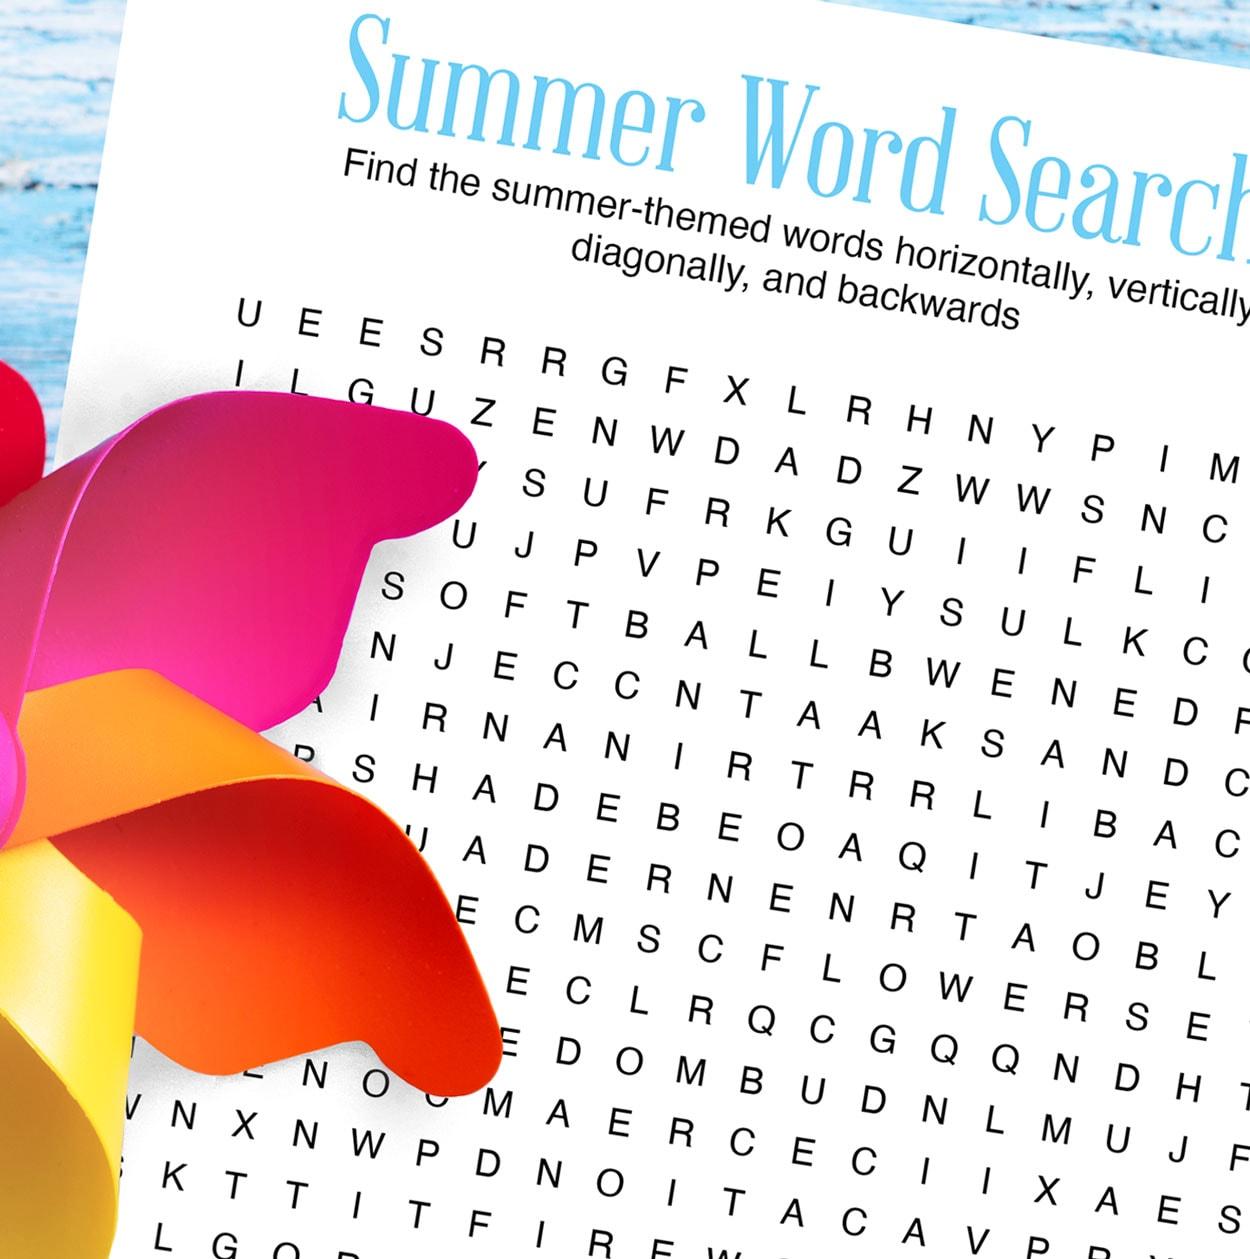 Summer Word Search Printable | Carla Schauer Designs